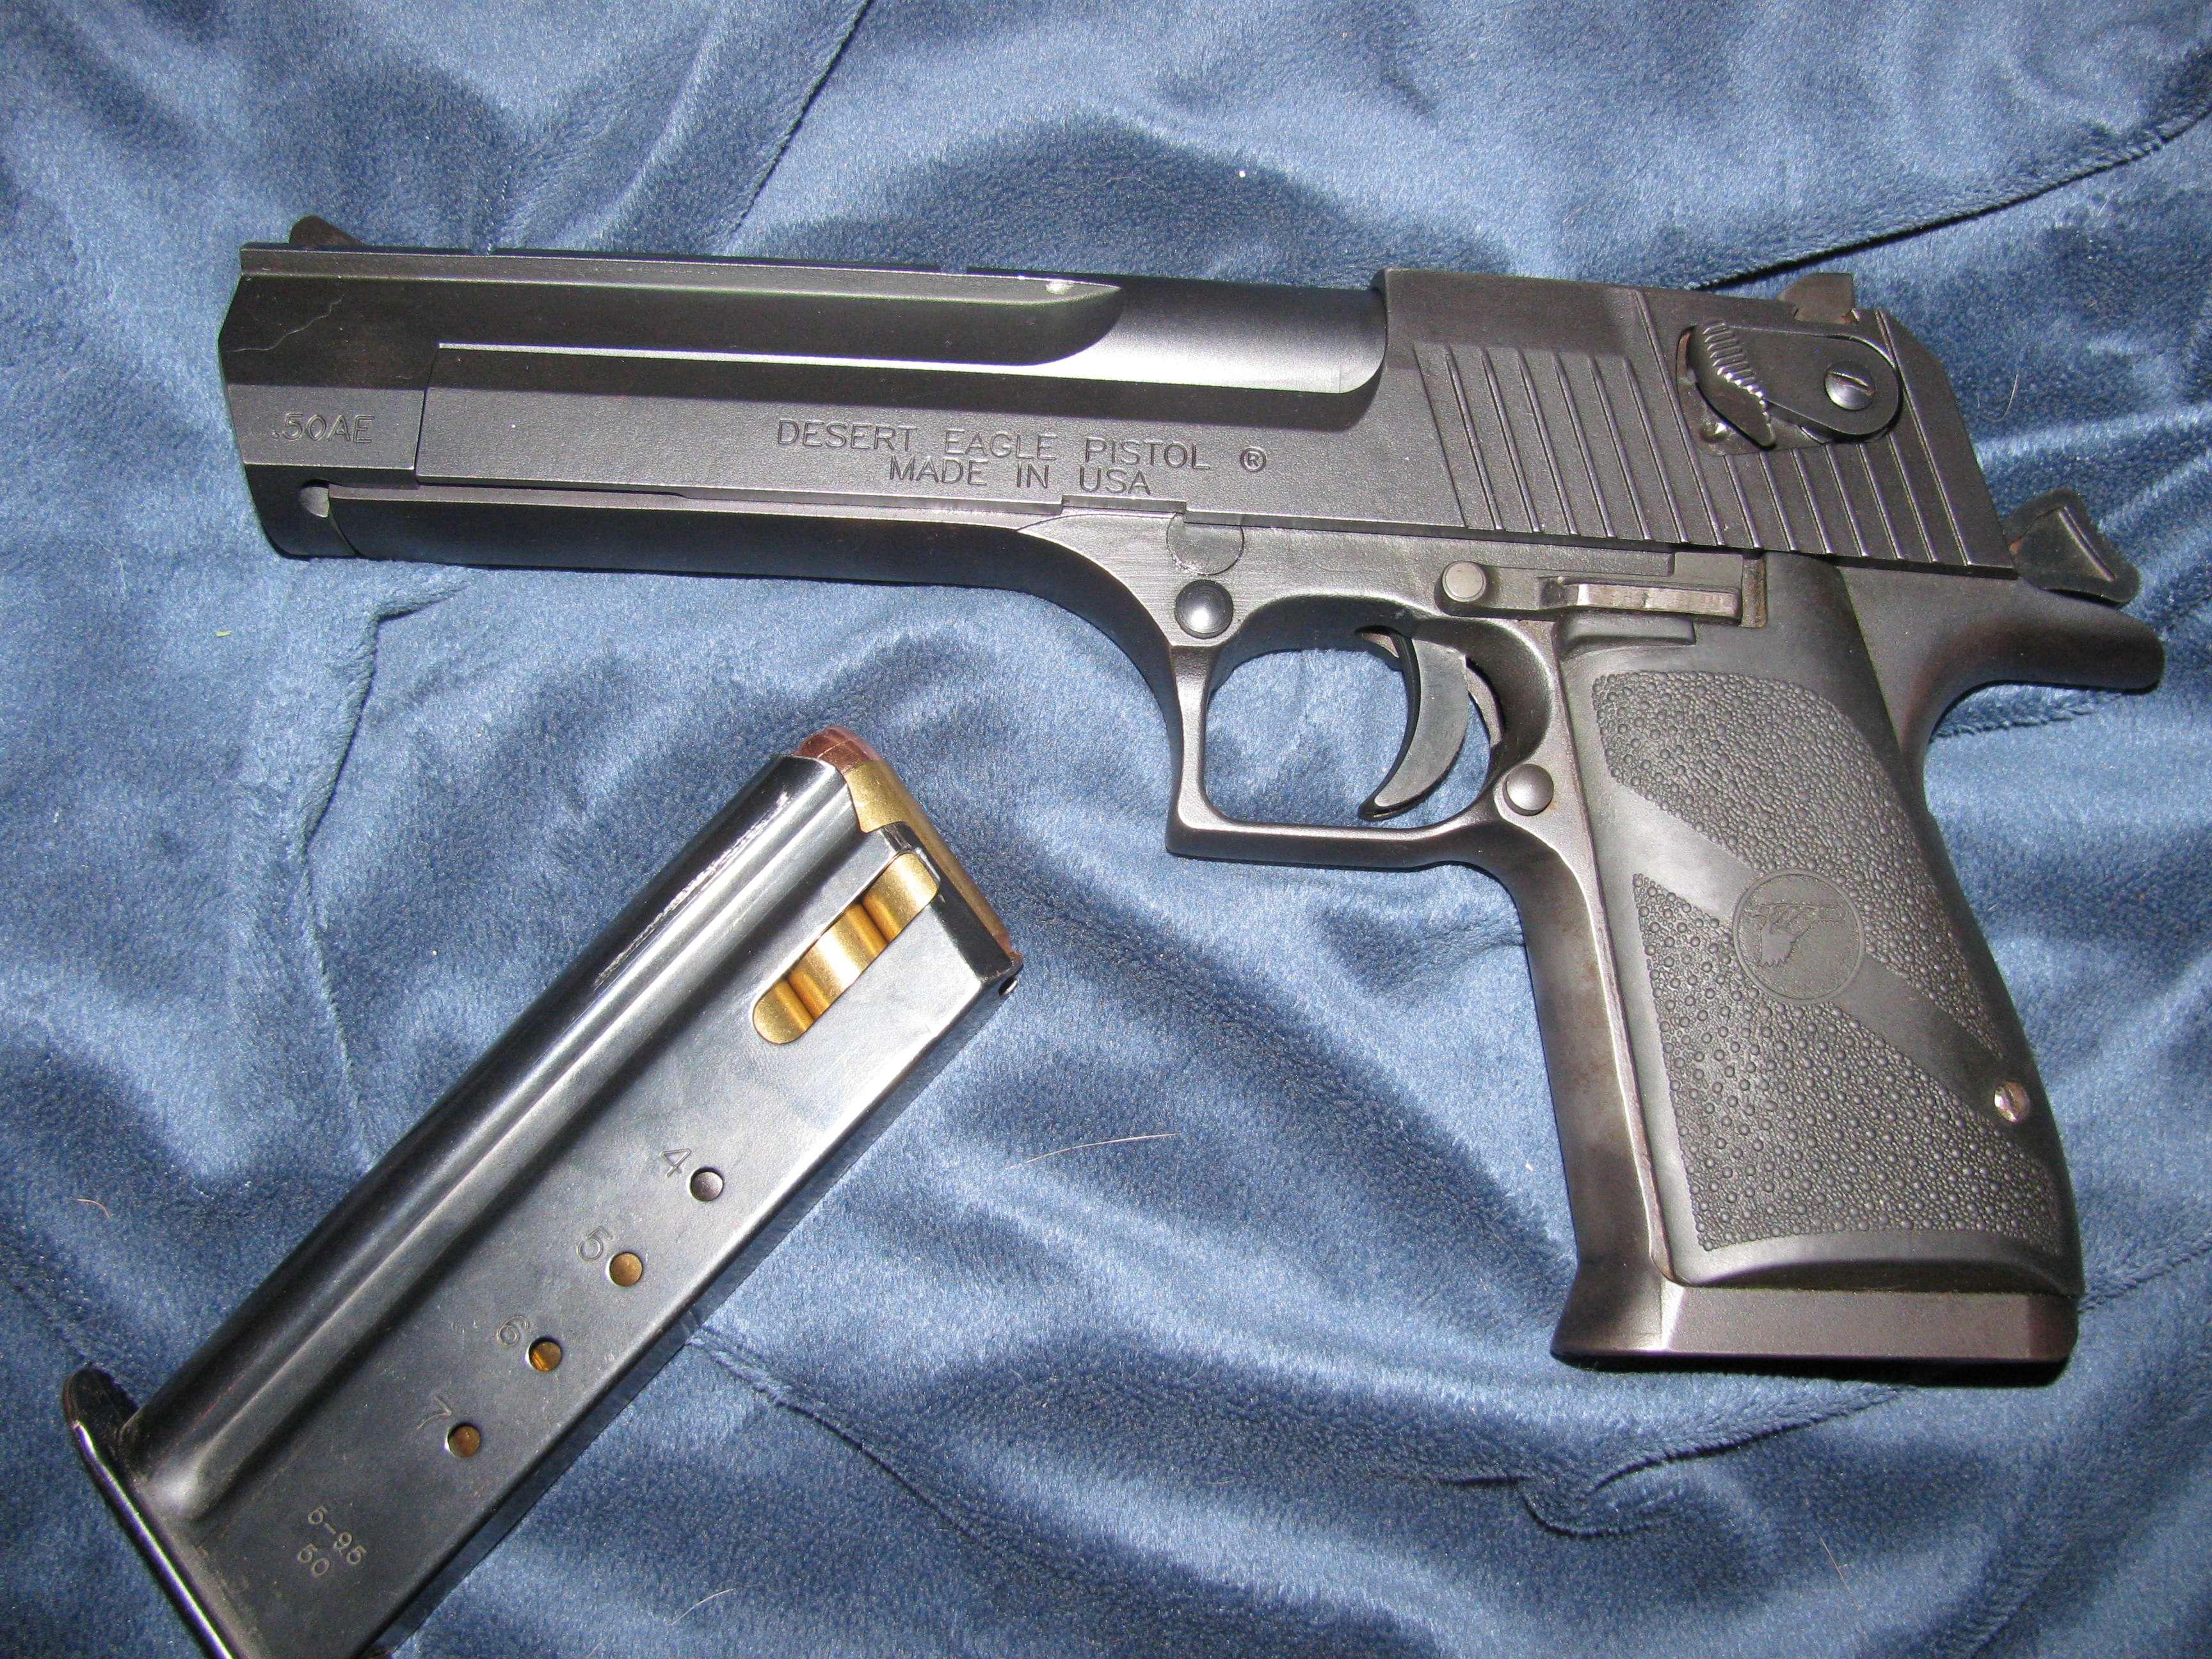 Pics pls !!! - General Handgun Discussion